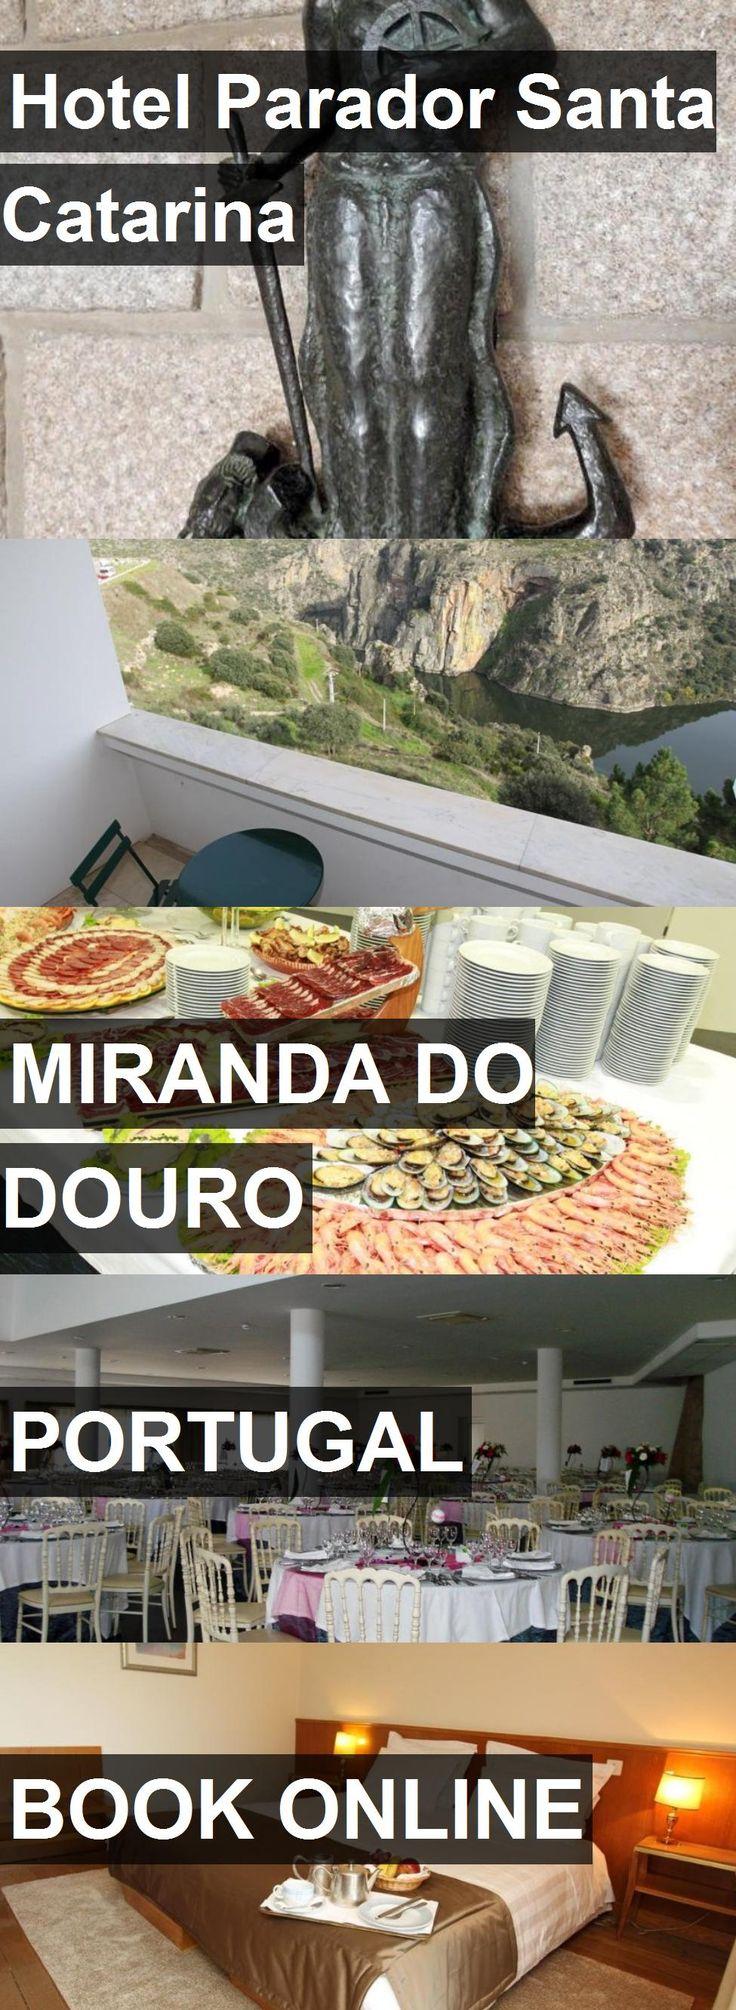 Hotel Parador Santa Catarina in Miranda do Douro, Portugal. For more information, photos, reviews and best prices please follow the link. #Portugal #MirandadoDouro #travel #vacation #hotel